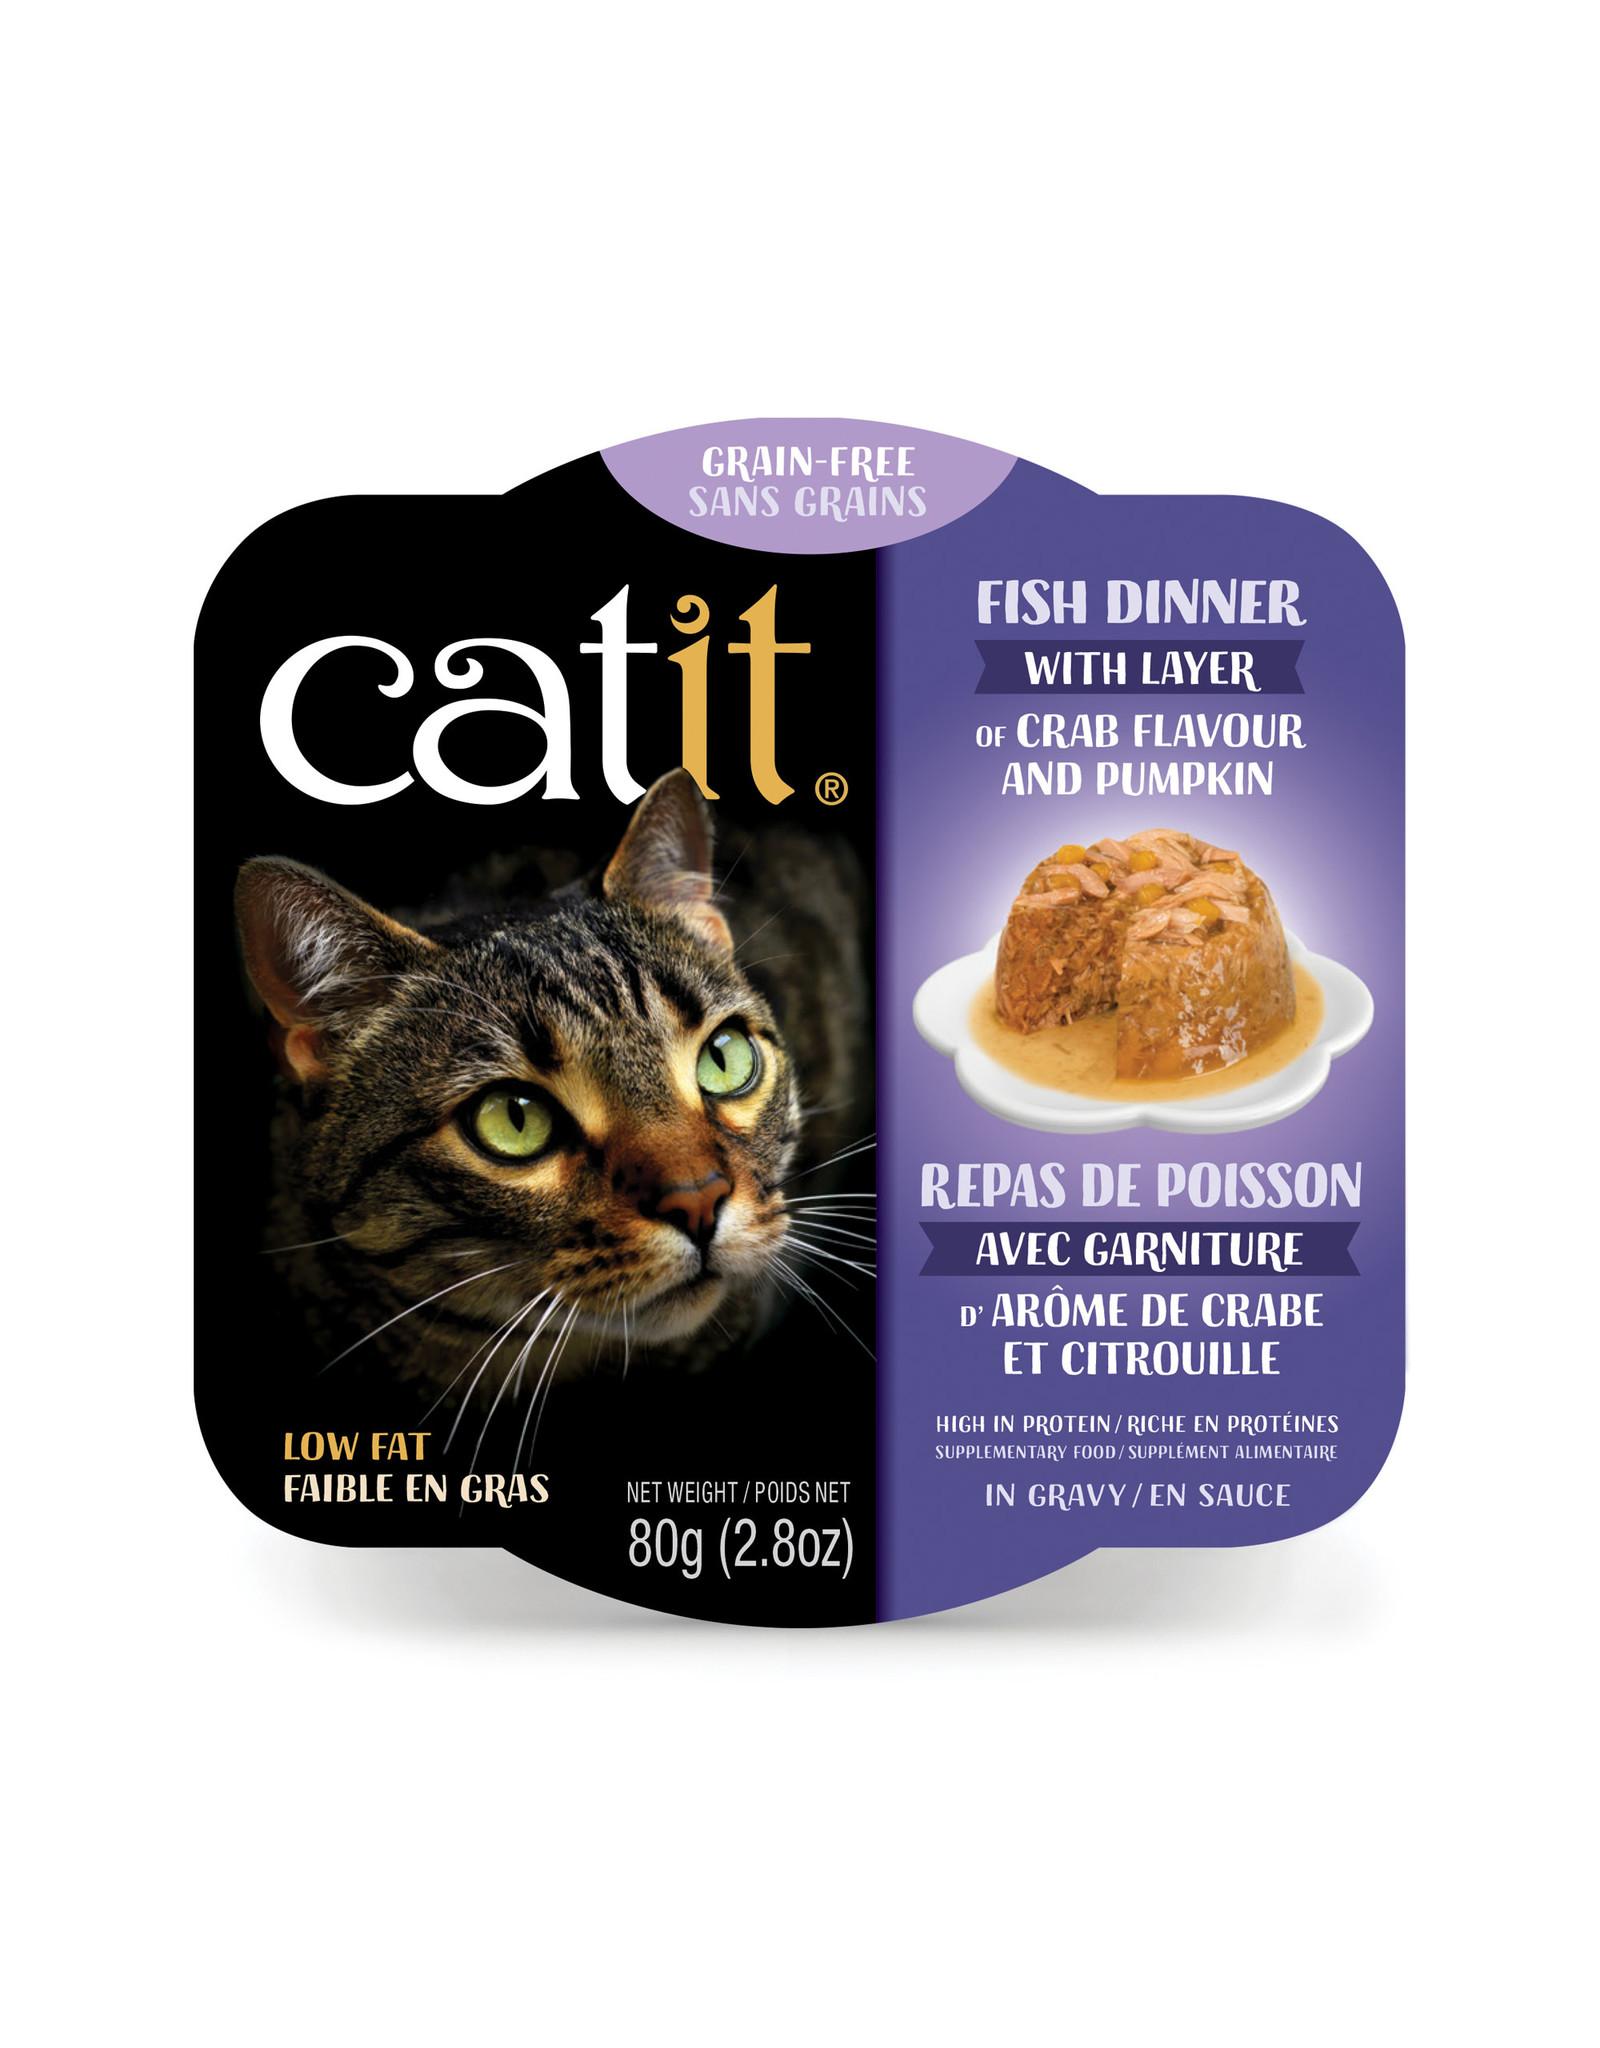 CatIt Fish Dinner with Crab Flavor & Pumpkin 80g